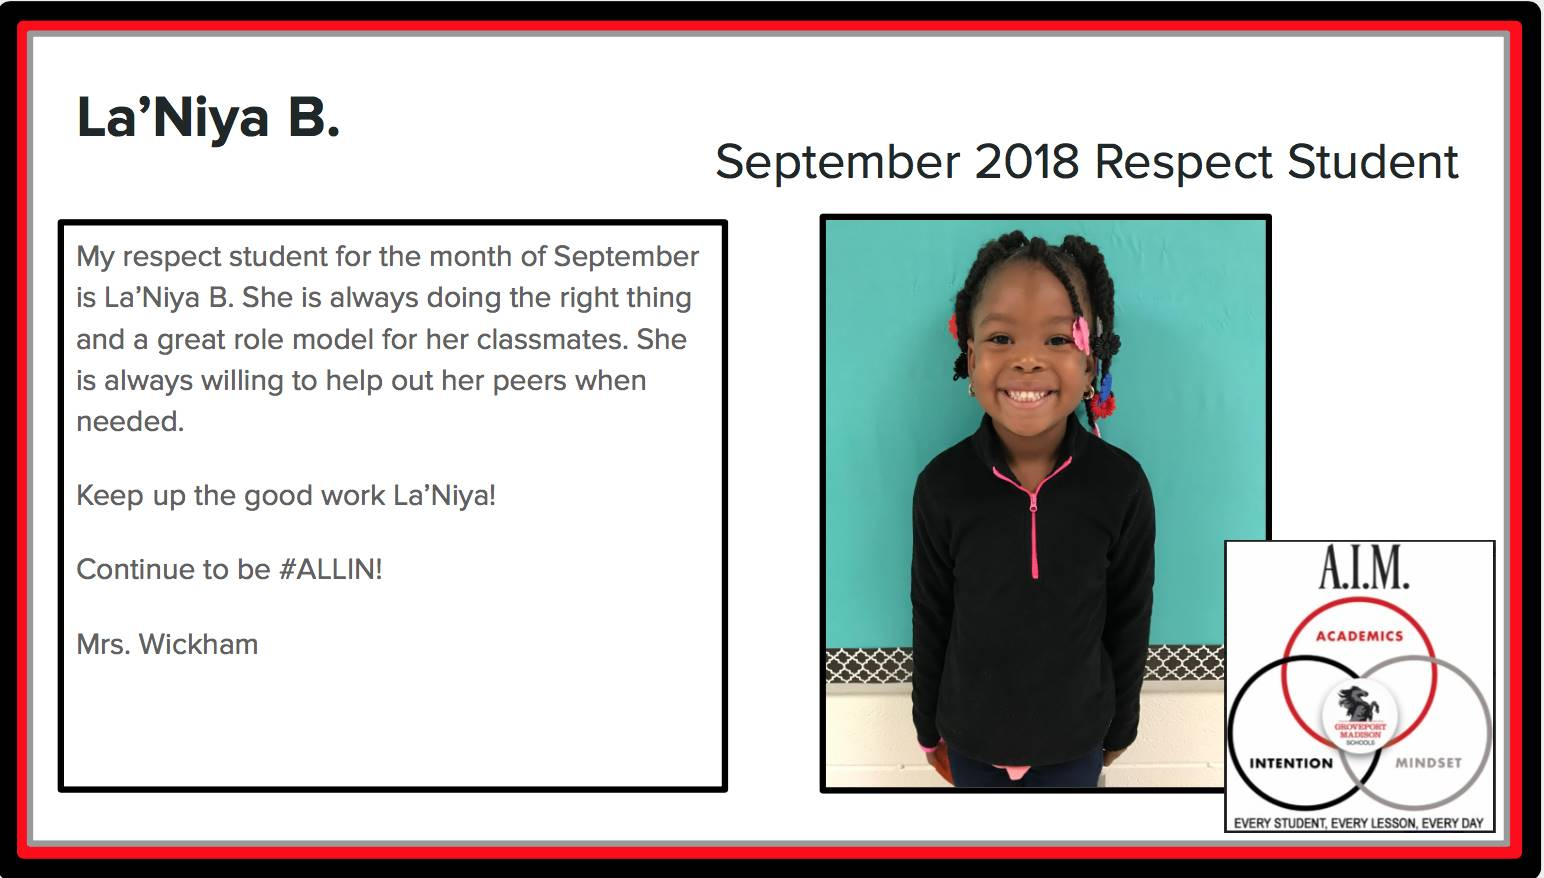 September Respect Student La'Niya